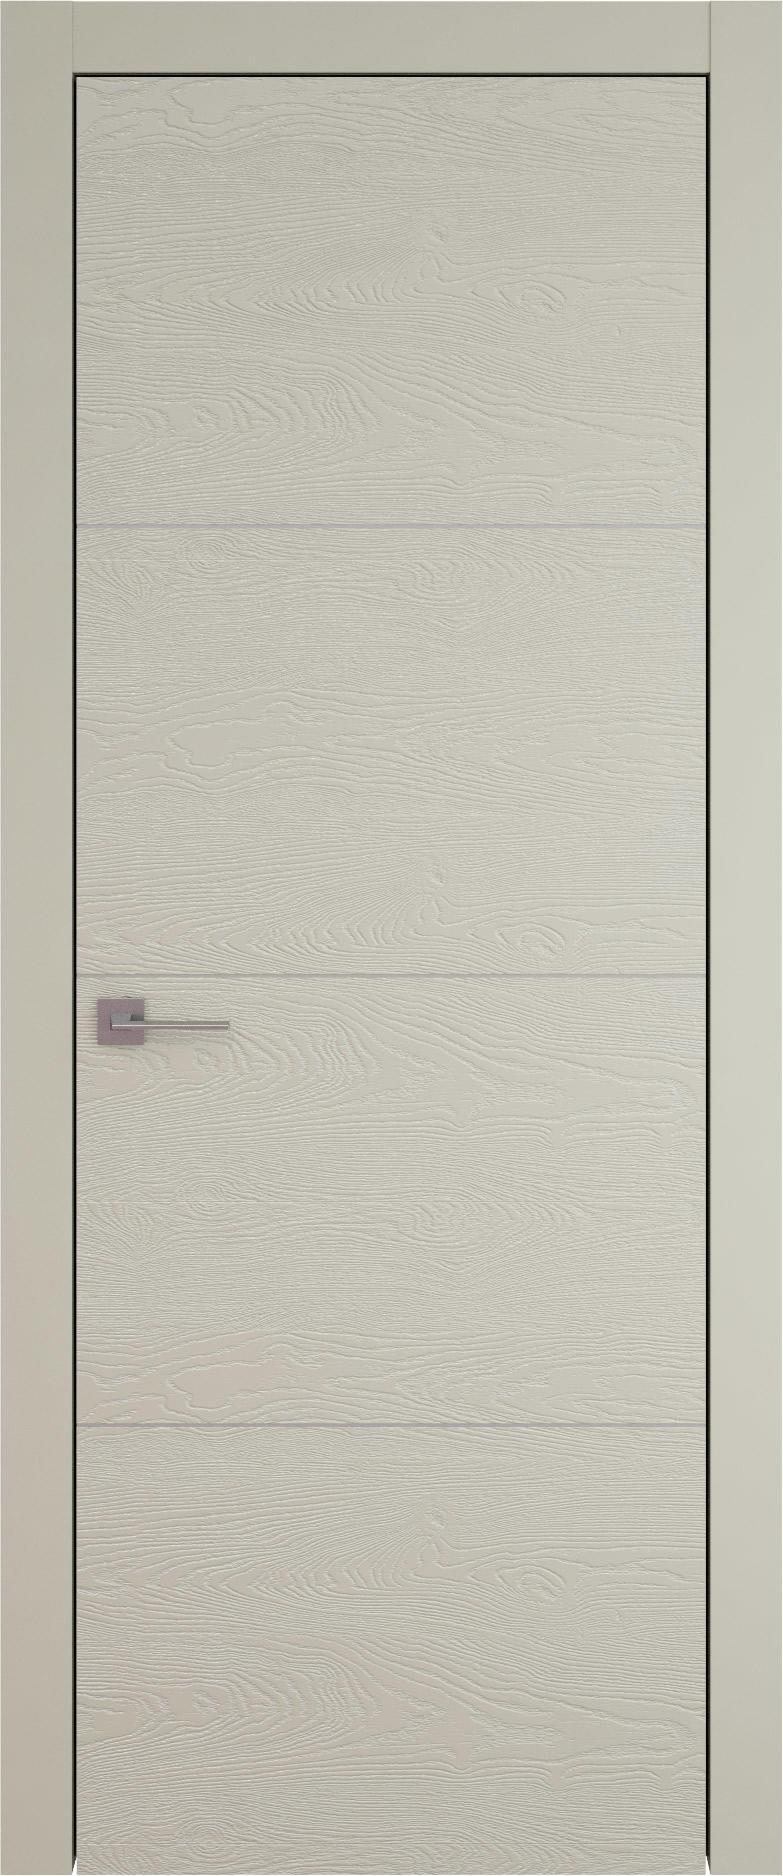 Tivoli Г-3 цвет - Серо-оливковая эмаль по шпону (RAL 7032) Без стекла (ДГ)